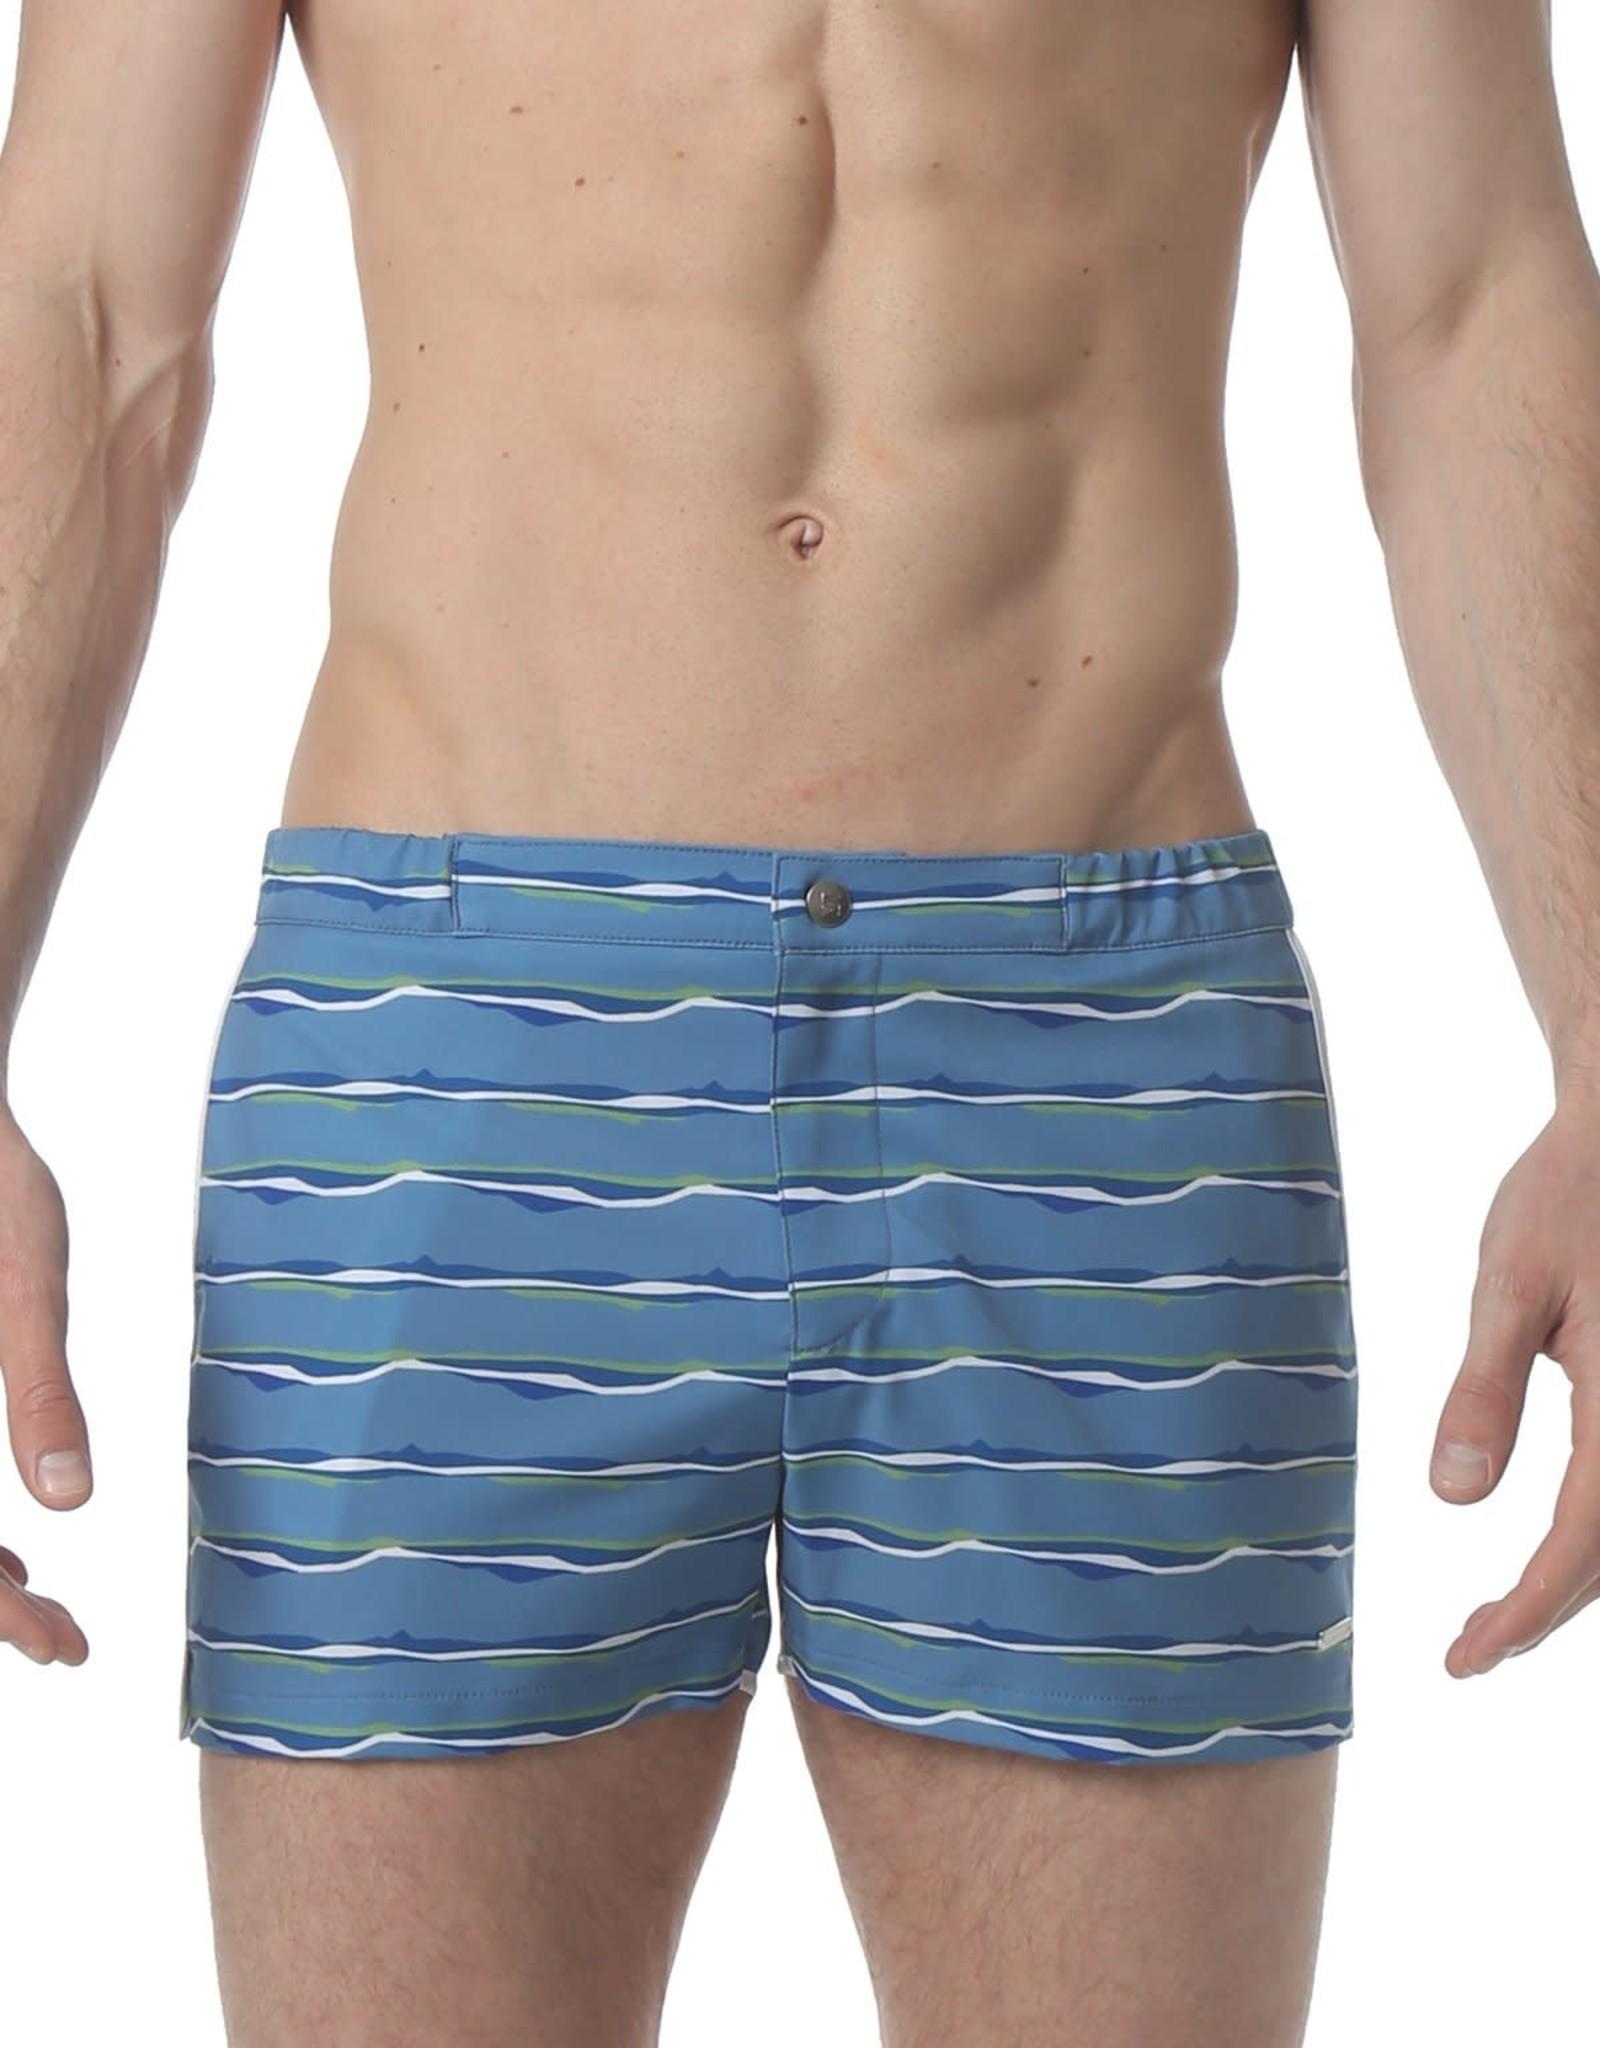 "parke & ronen 2"" Angeleno Stripe Swim Short"